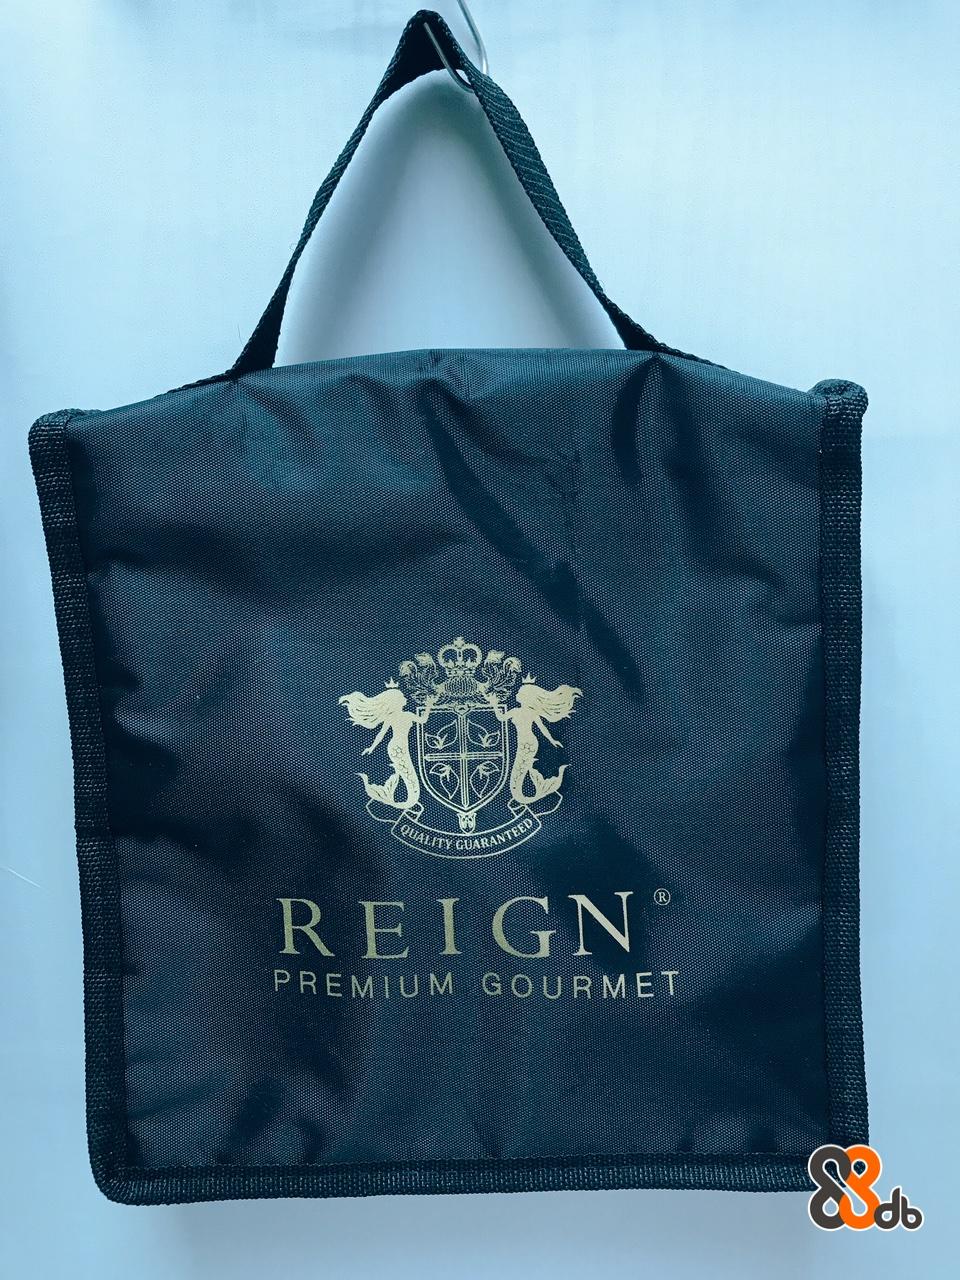 REIGN PREMIUM GOURMET db  Bag,Handbag,Blue,Product,Fashion accessory